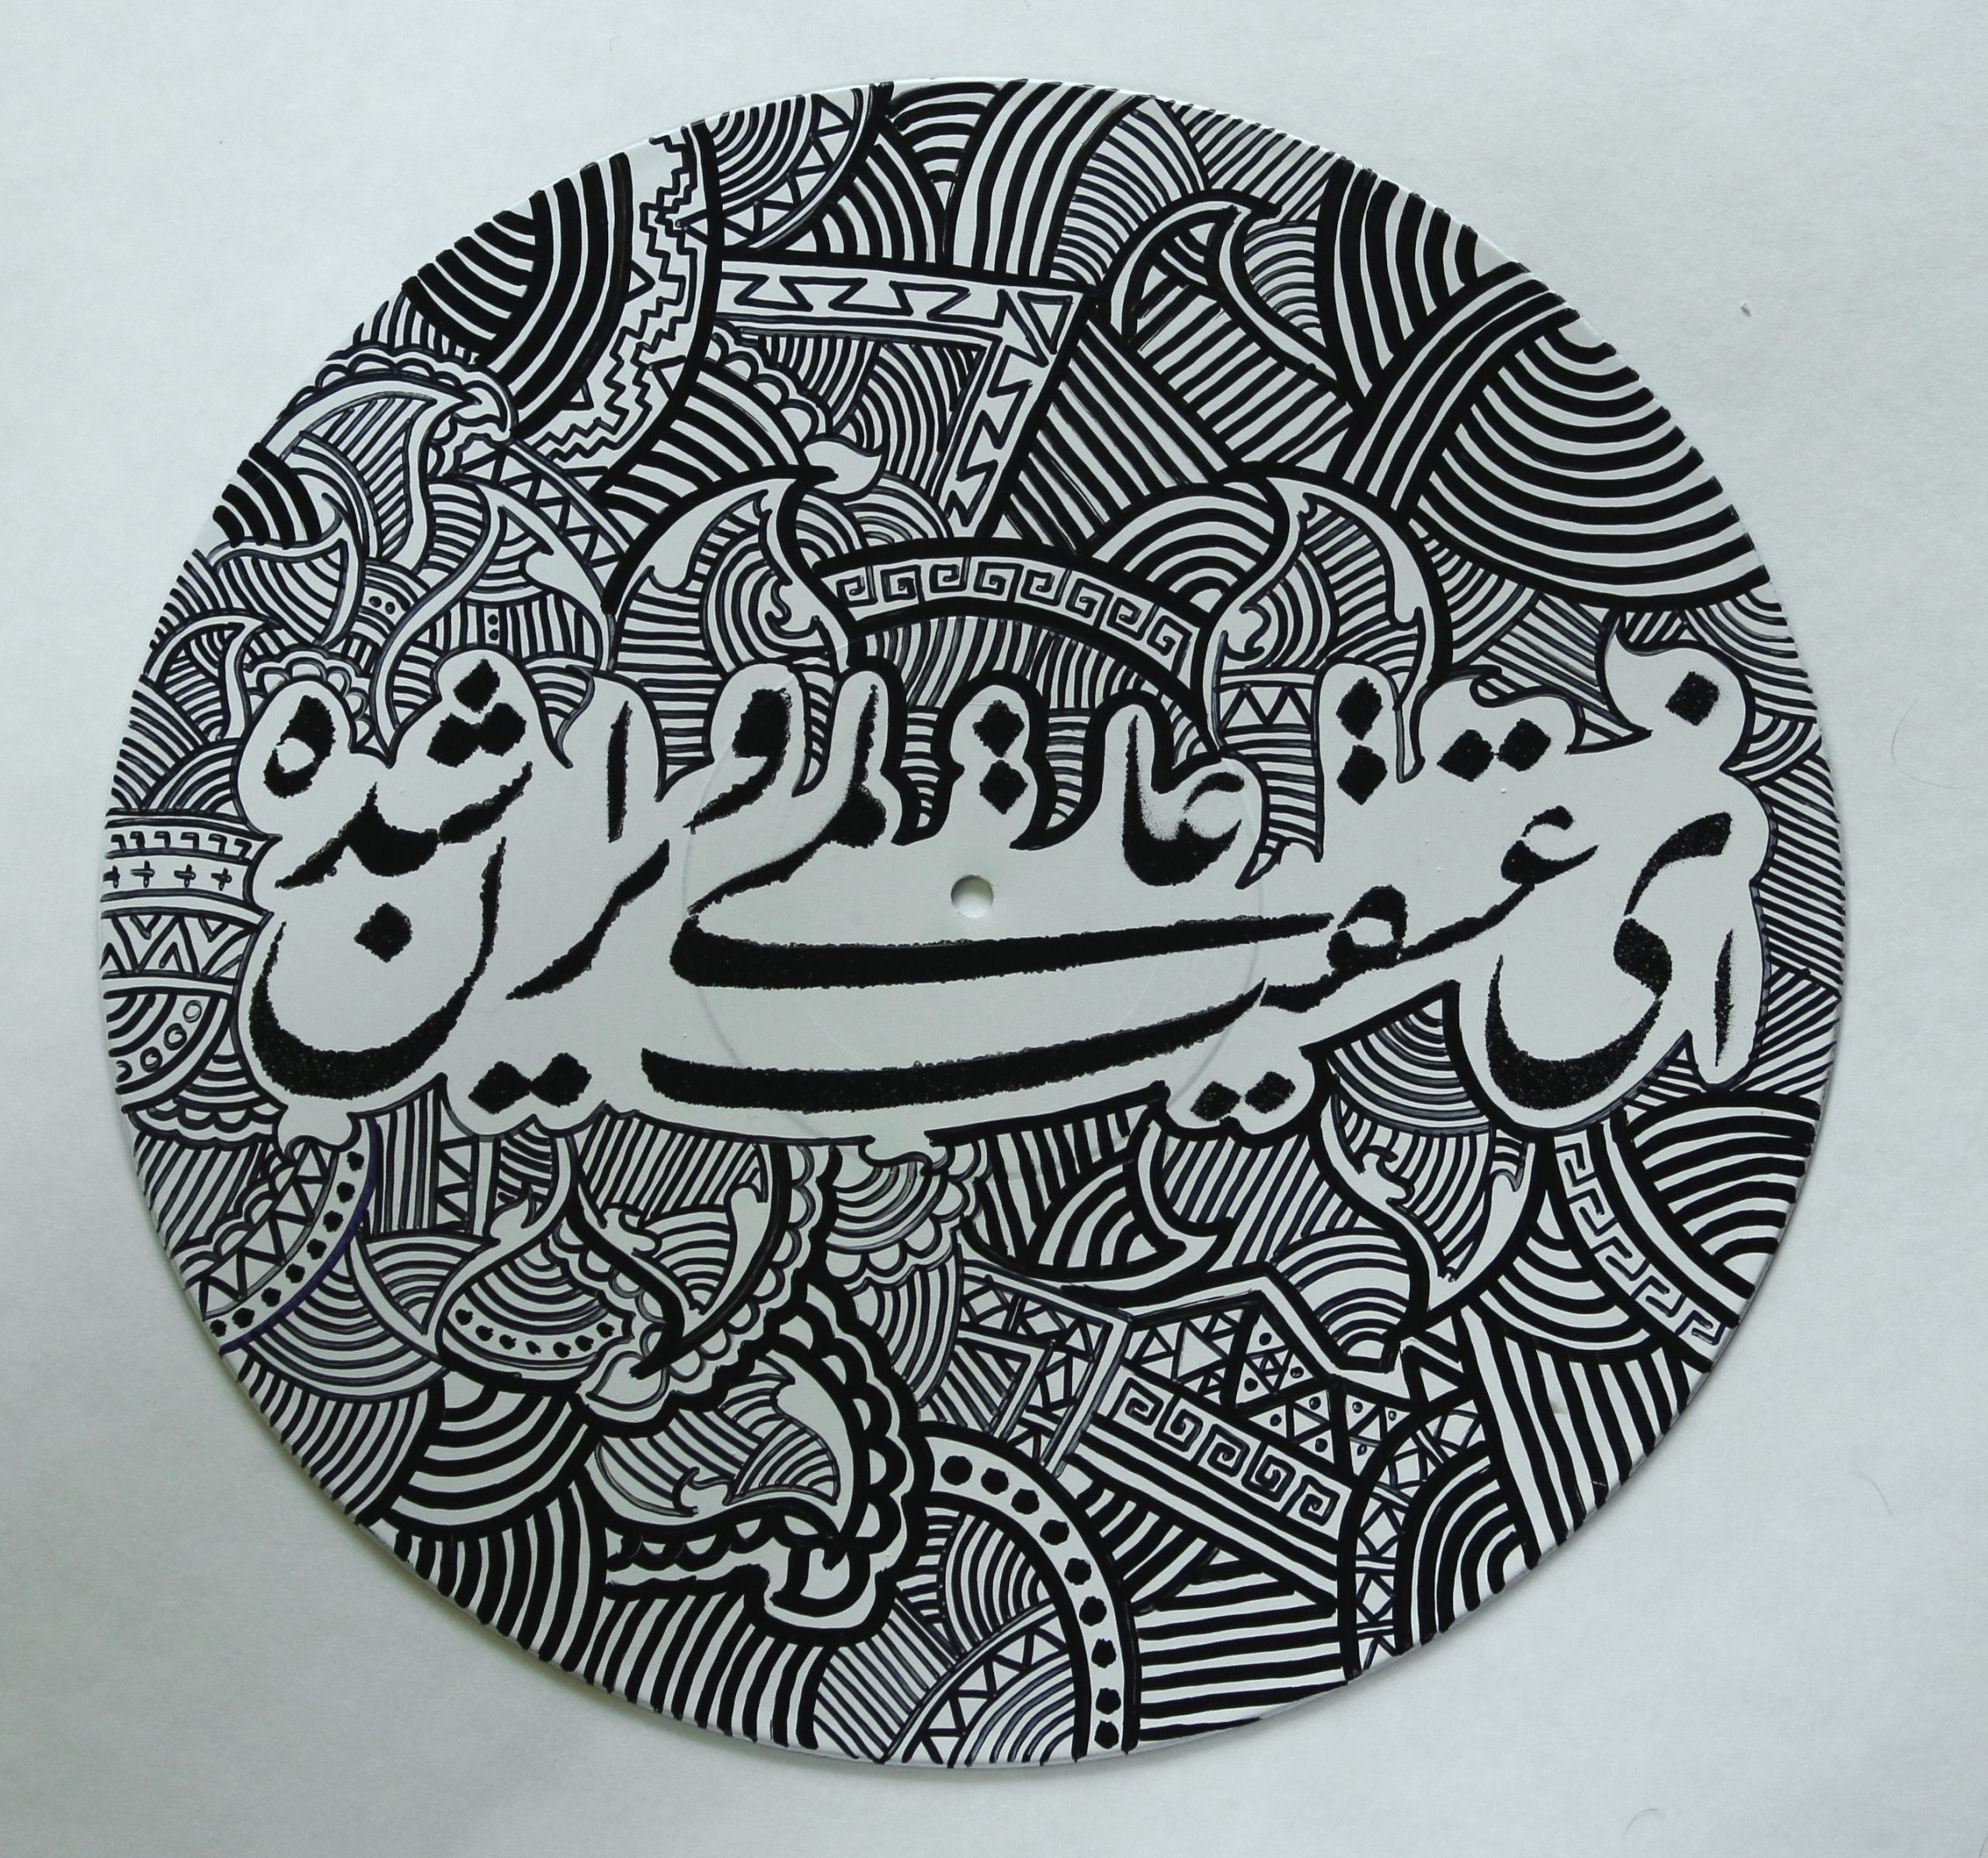 Rumi in Love by Iranian artist Keyvan Heydari Shovir